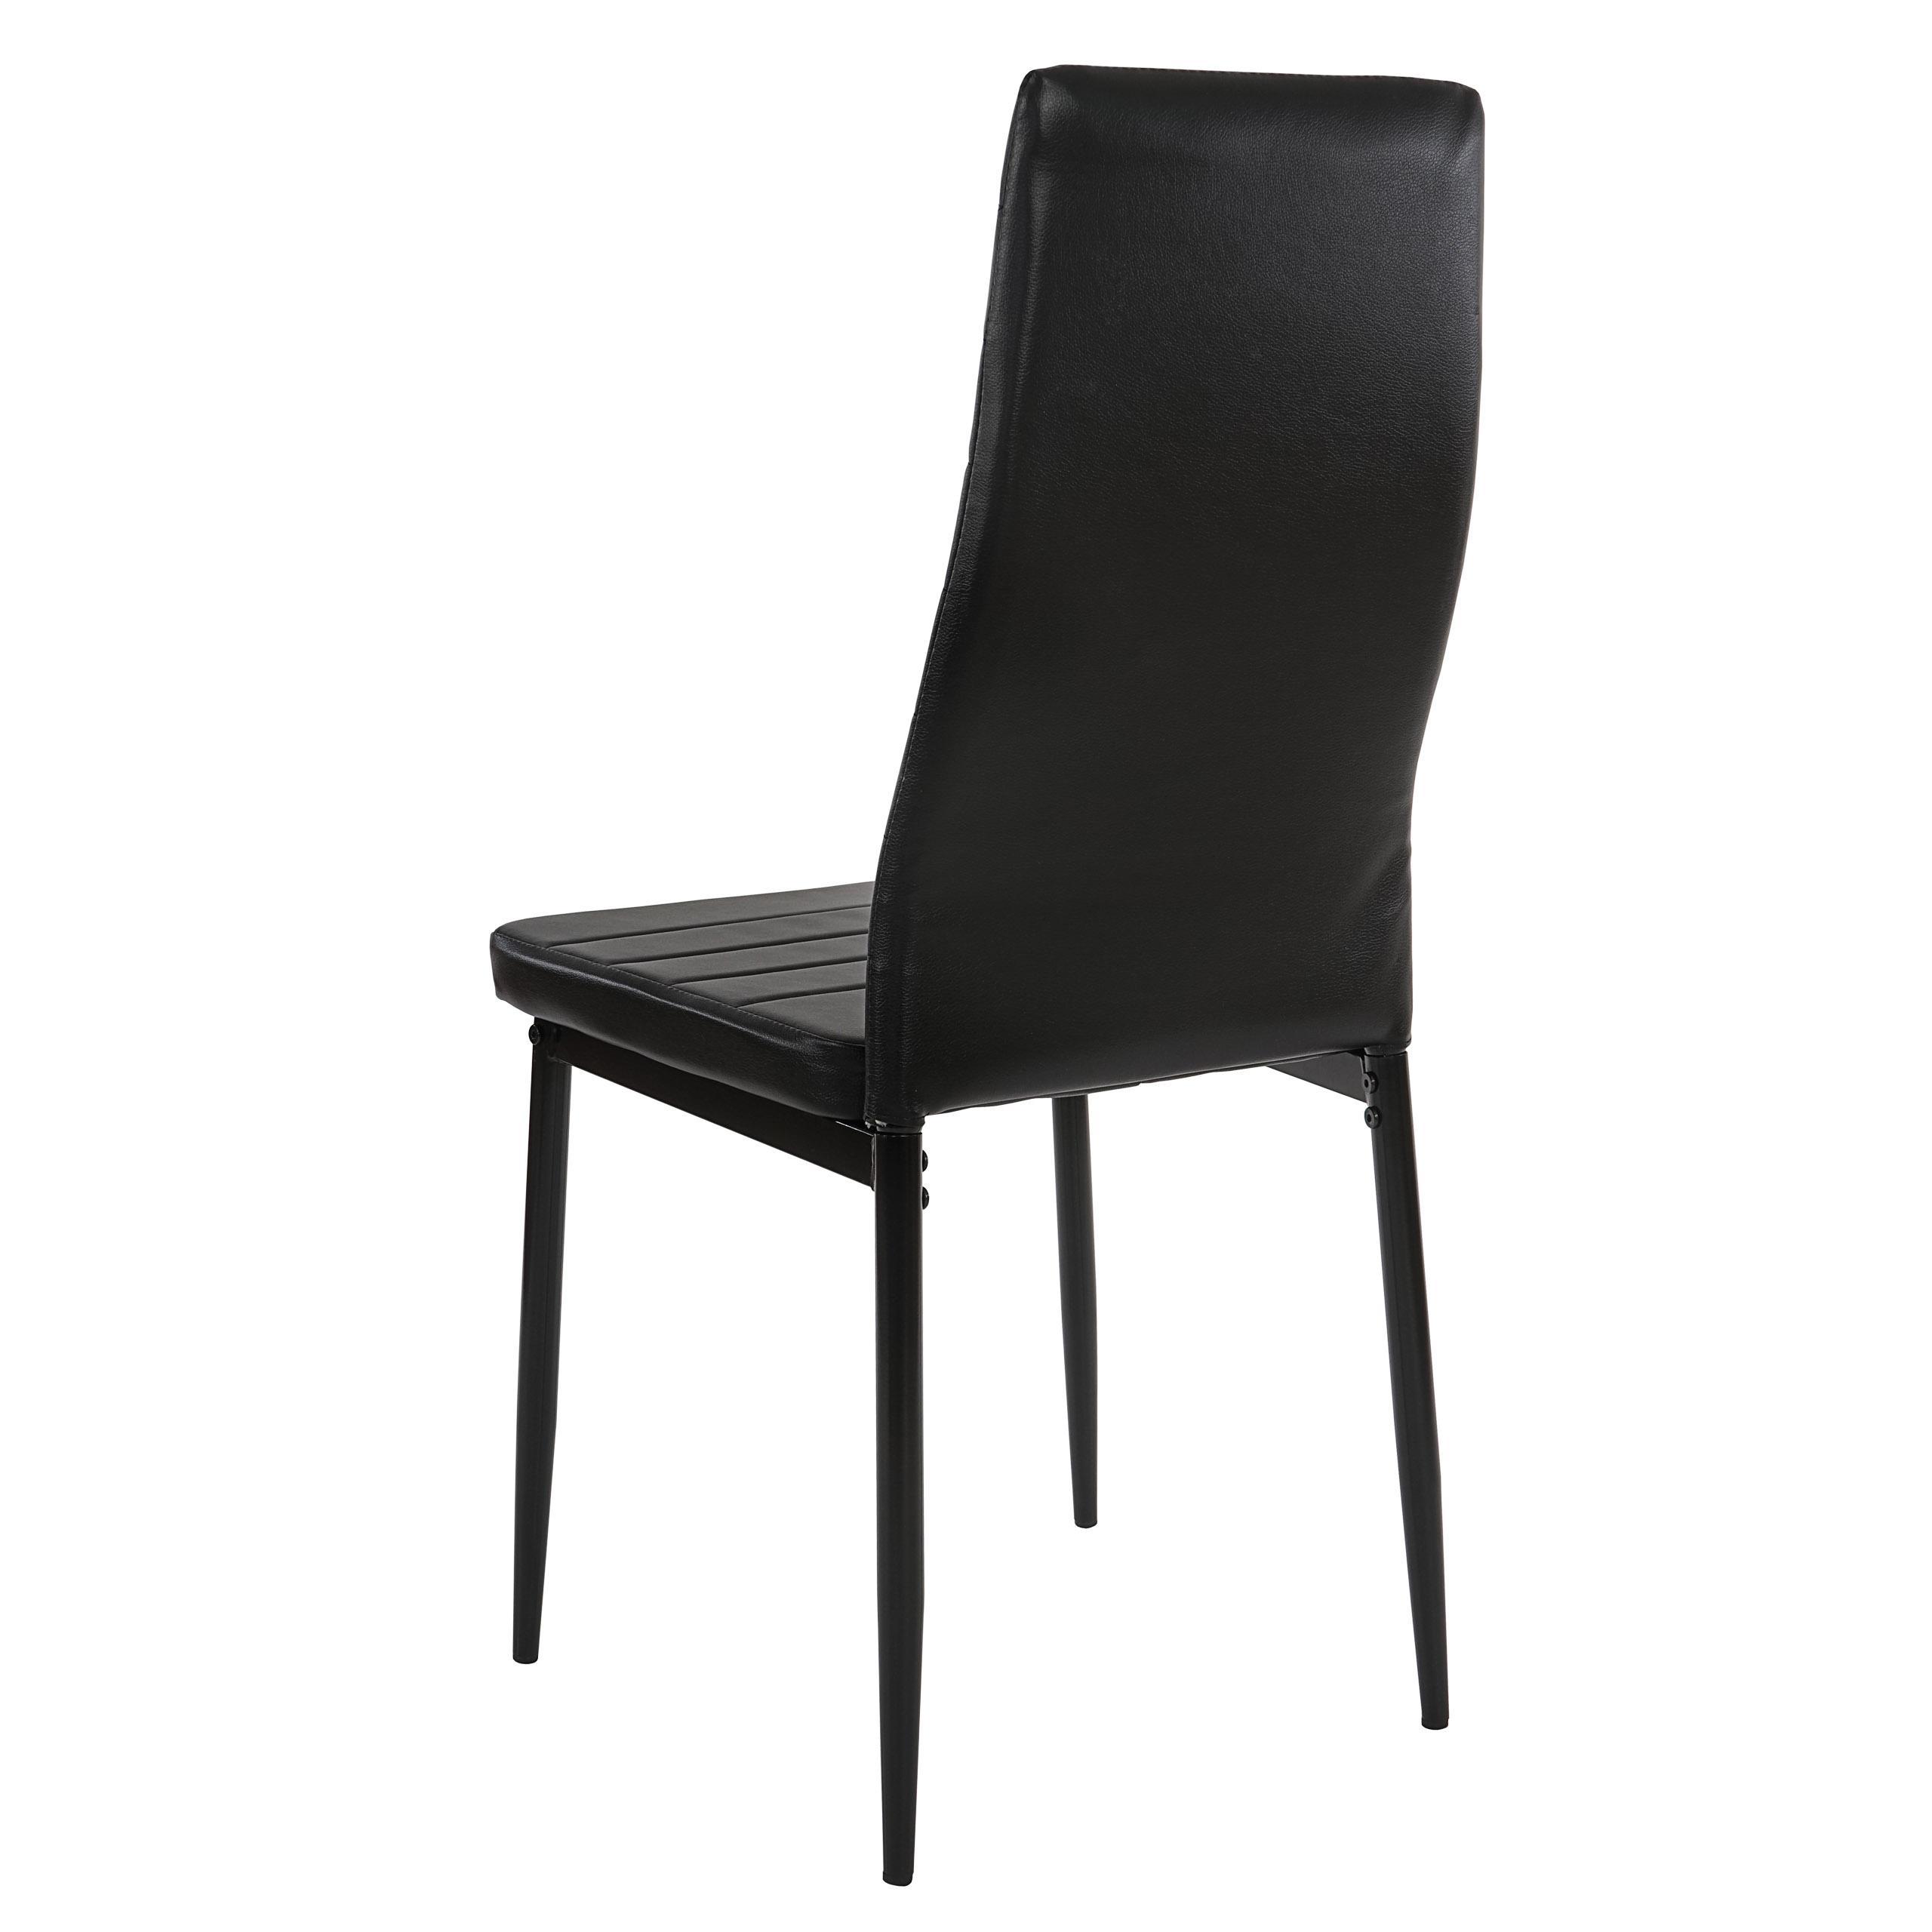 Lote 6 sillas de comedor o cocina calisa gran dise o con for Sillas de comedor tapizadas en piel